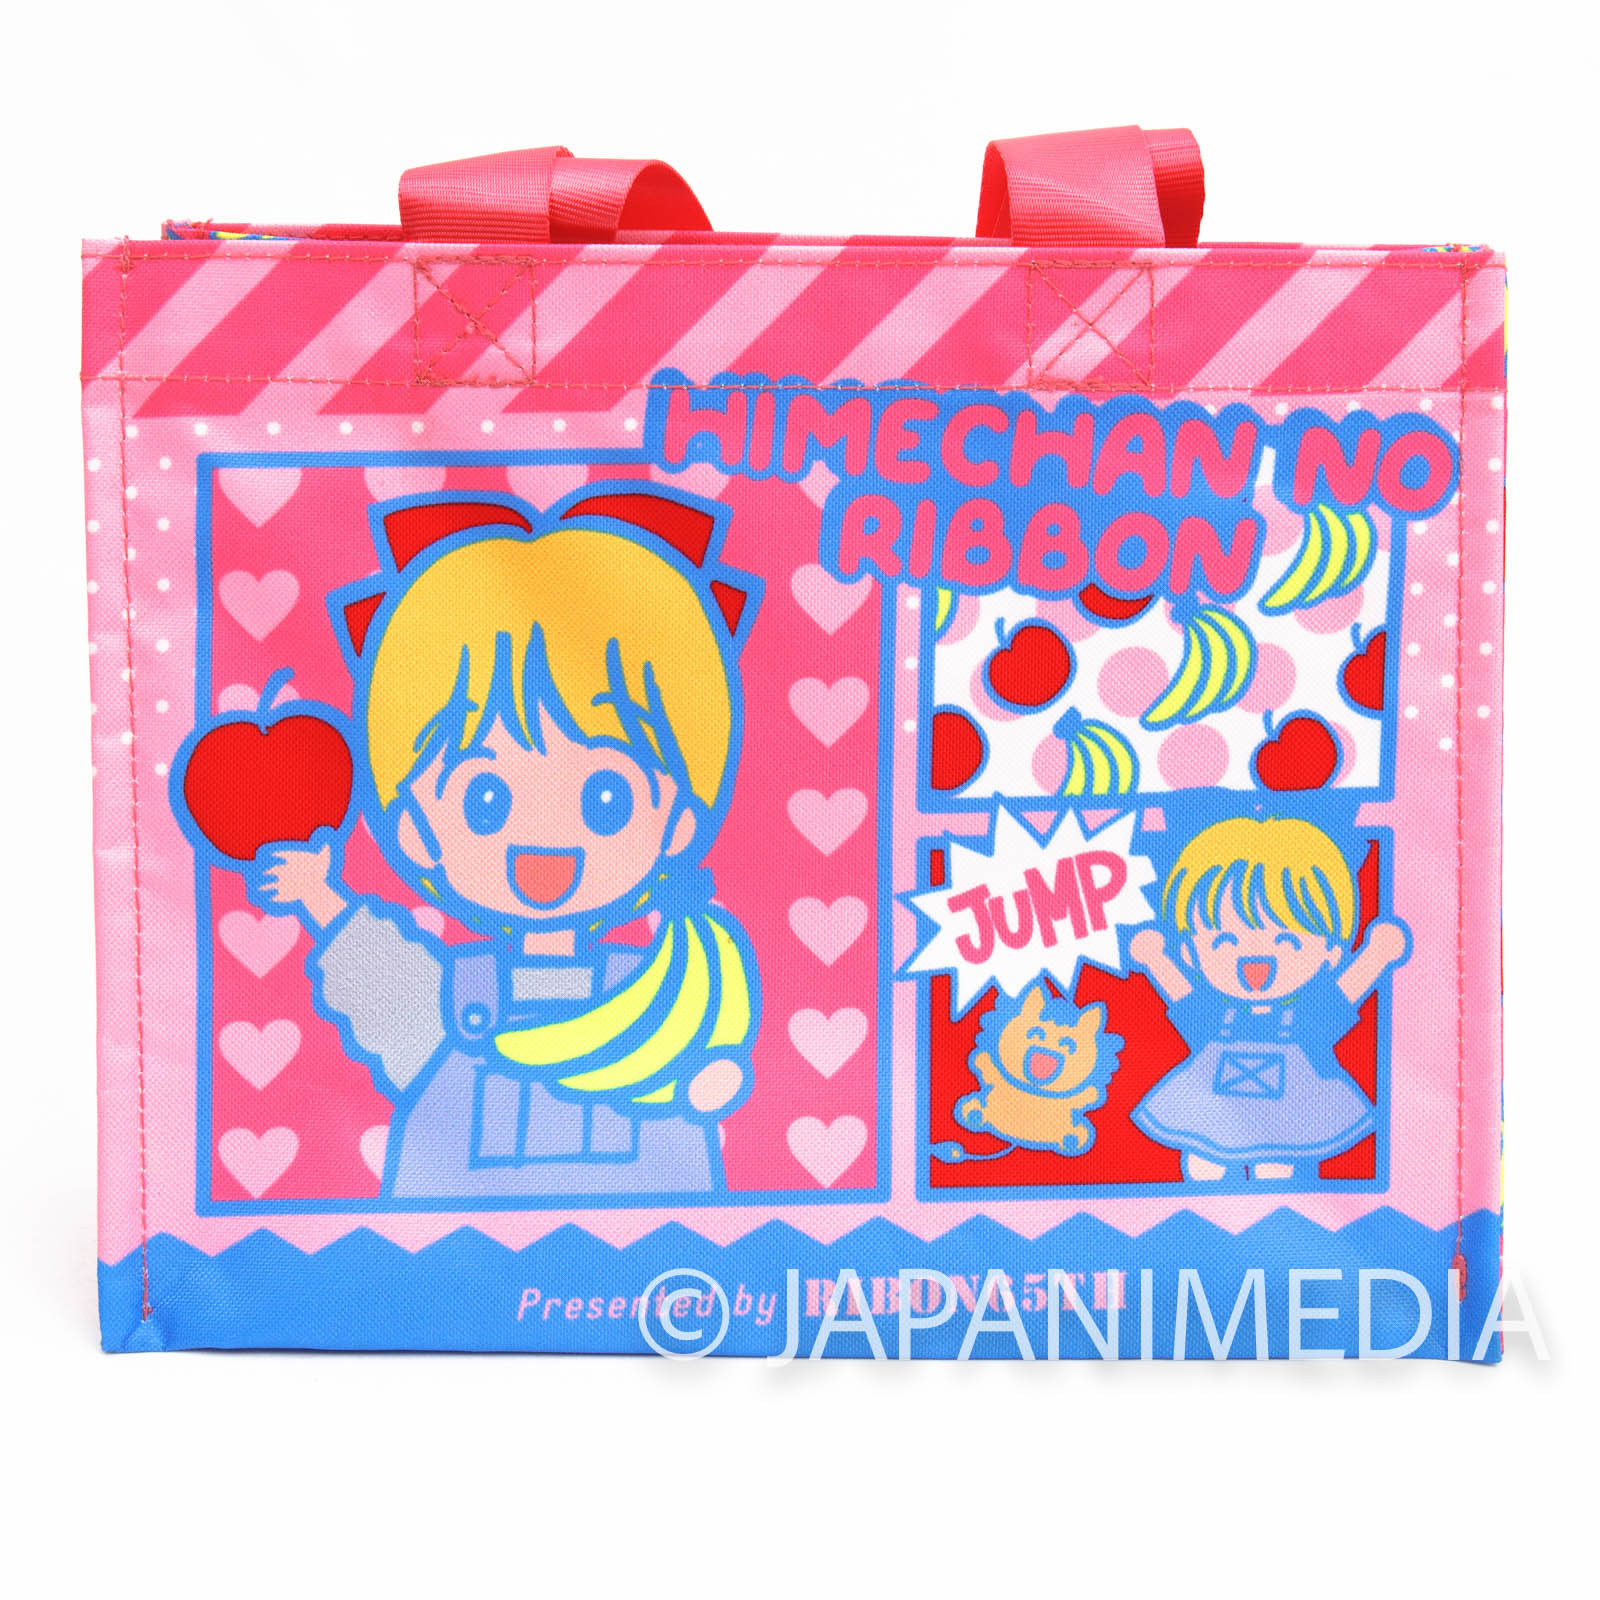 Hime-chan's Ribbon Ribon 65th Anniversary Bag JAPAN MANGA